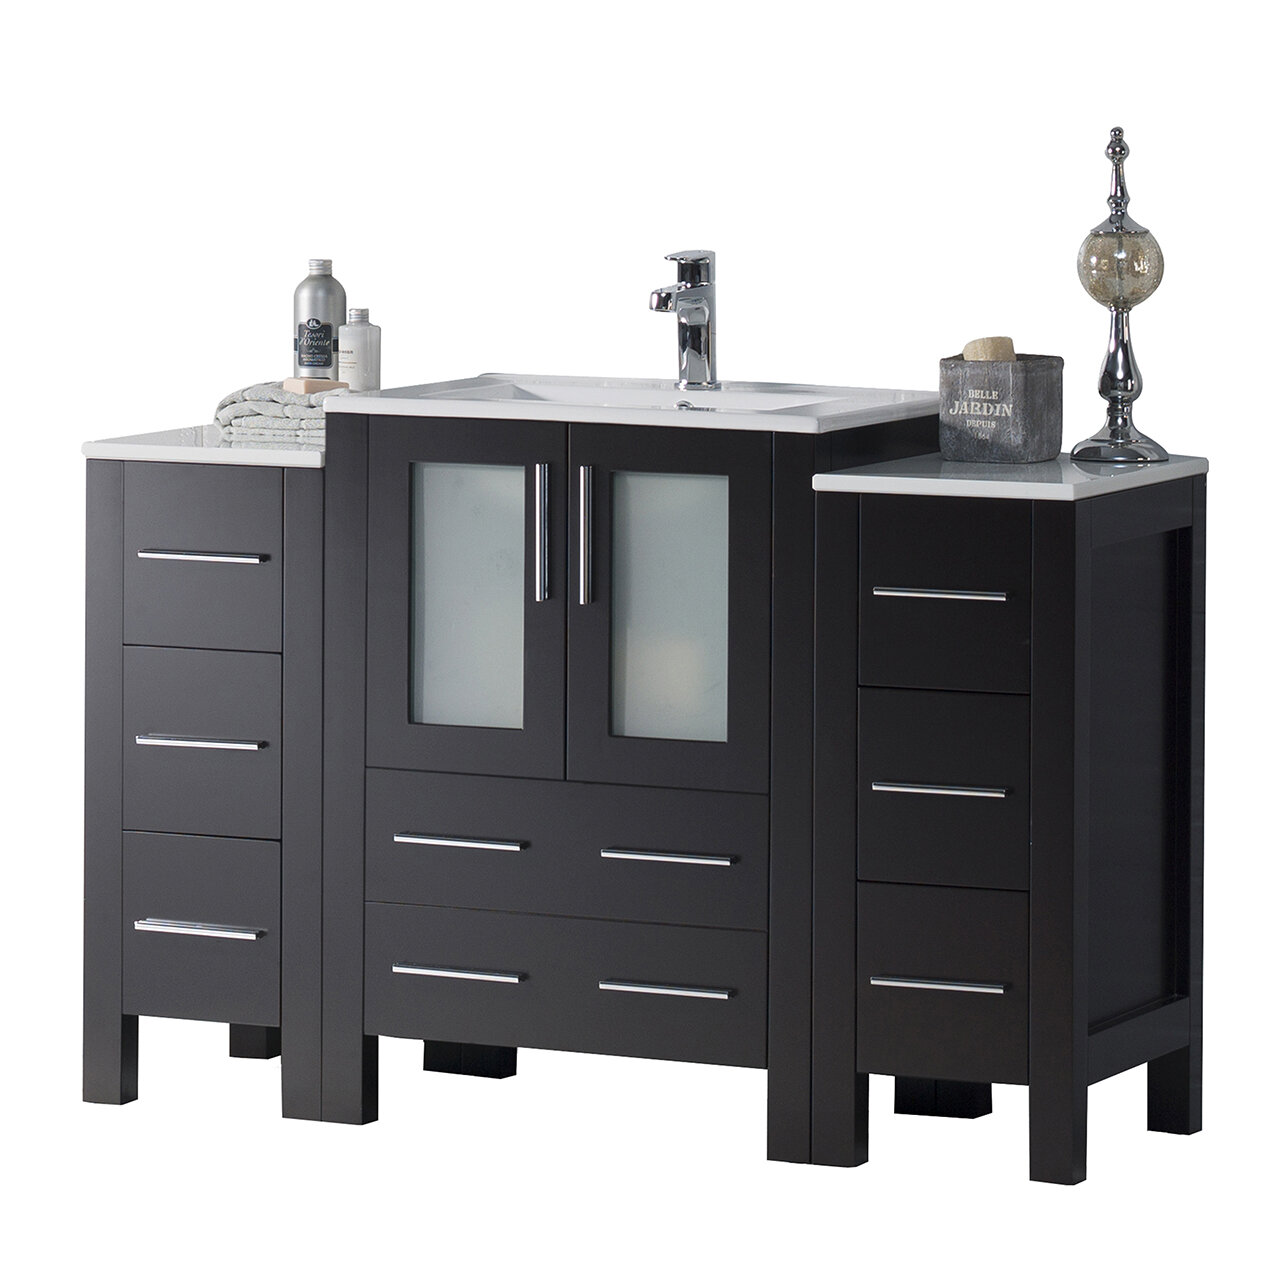 "7"" Single Bathroom Vanity Base Only"